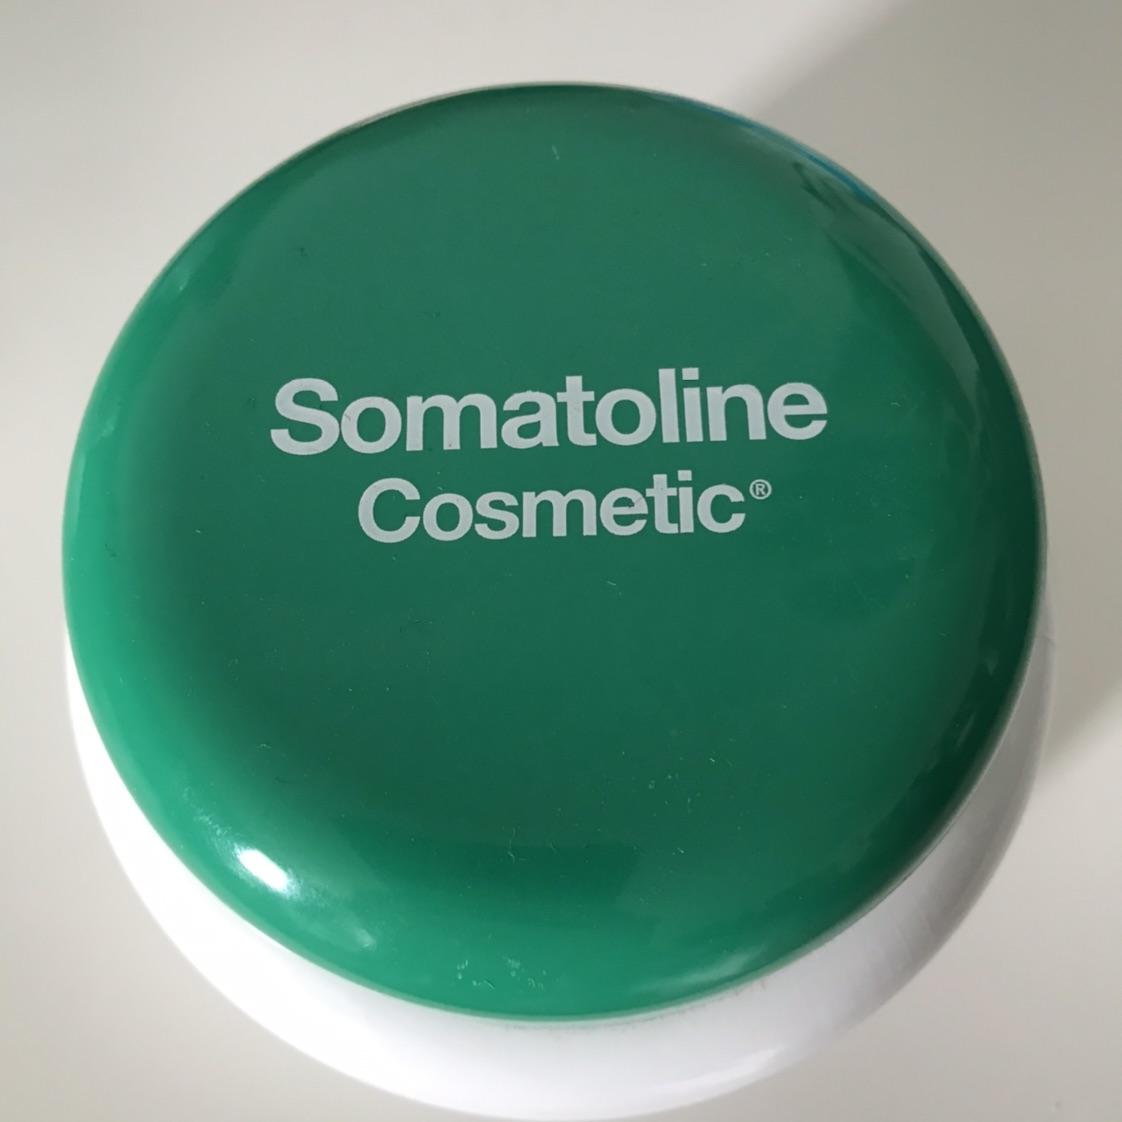 Somatoline Cosmetic瘦身霜